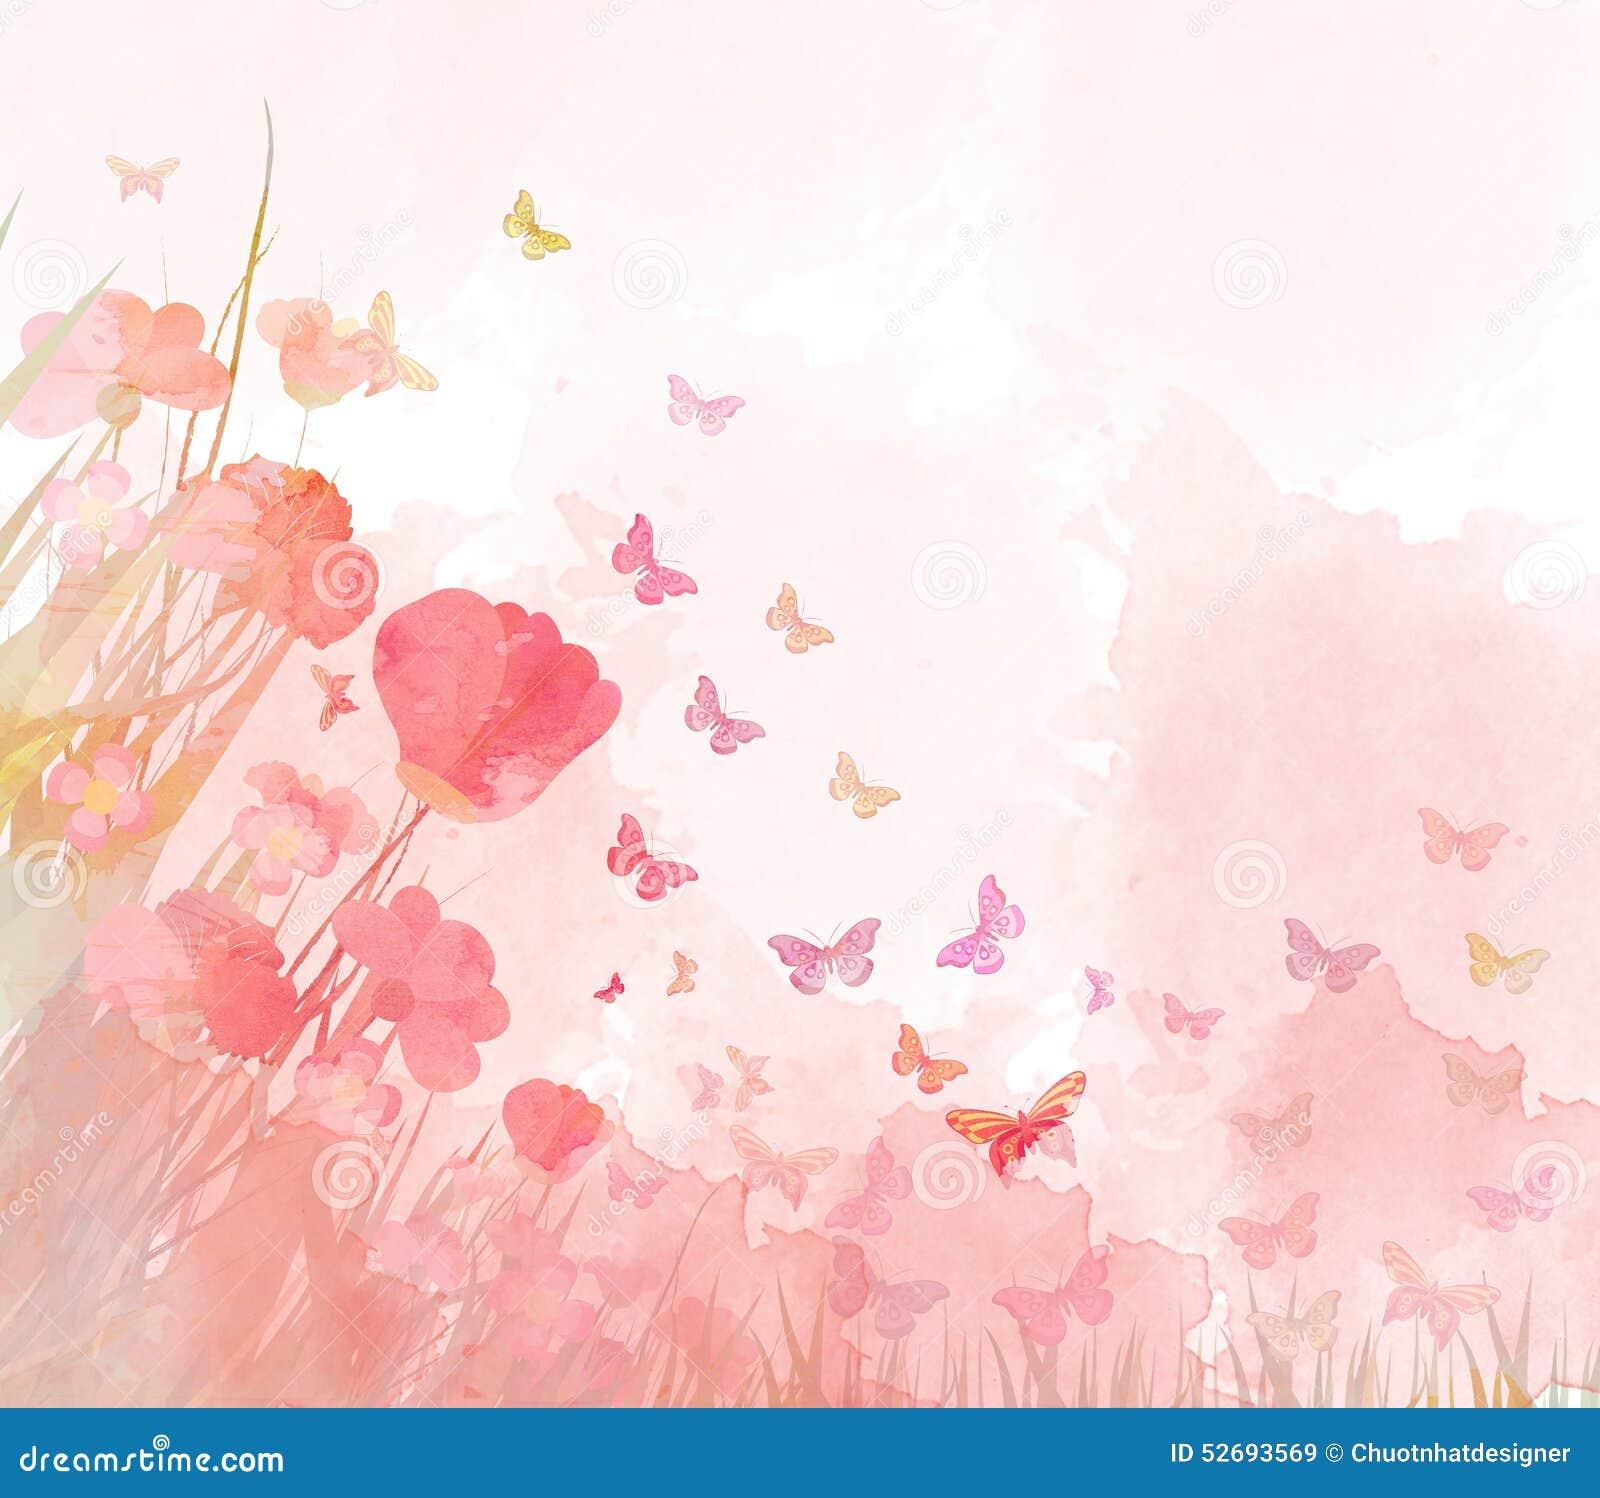 Watercolor butterflies background